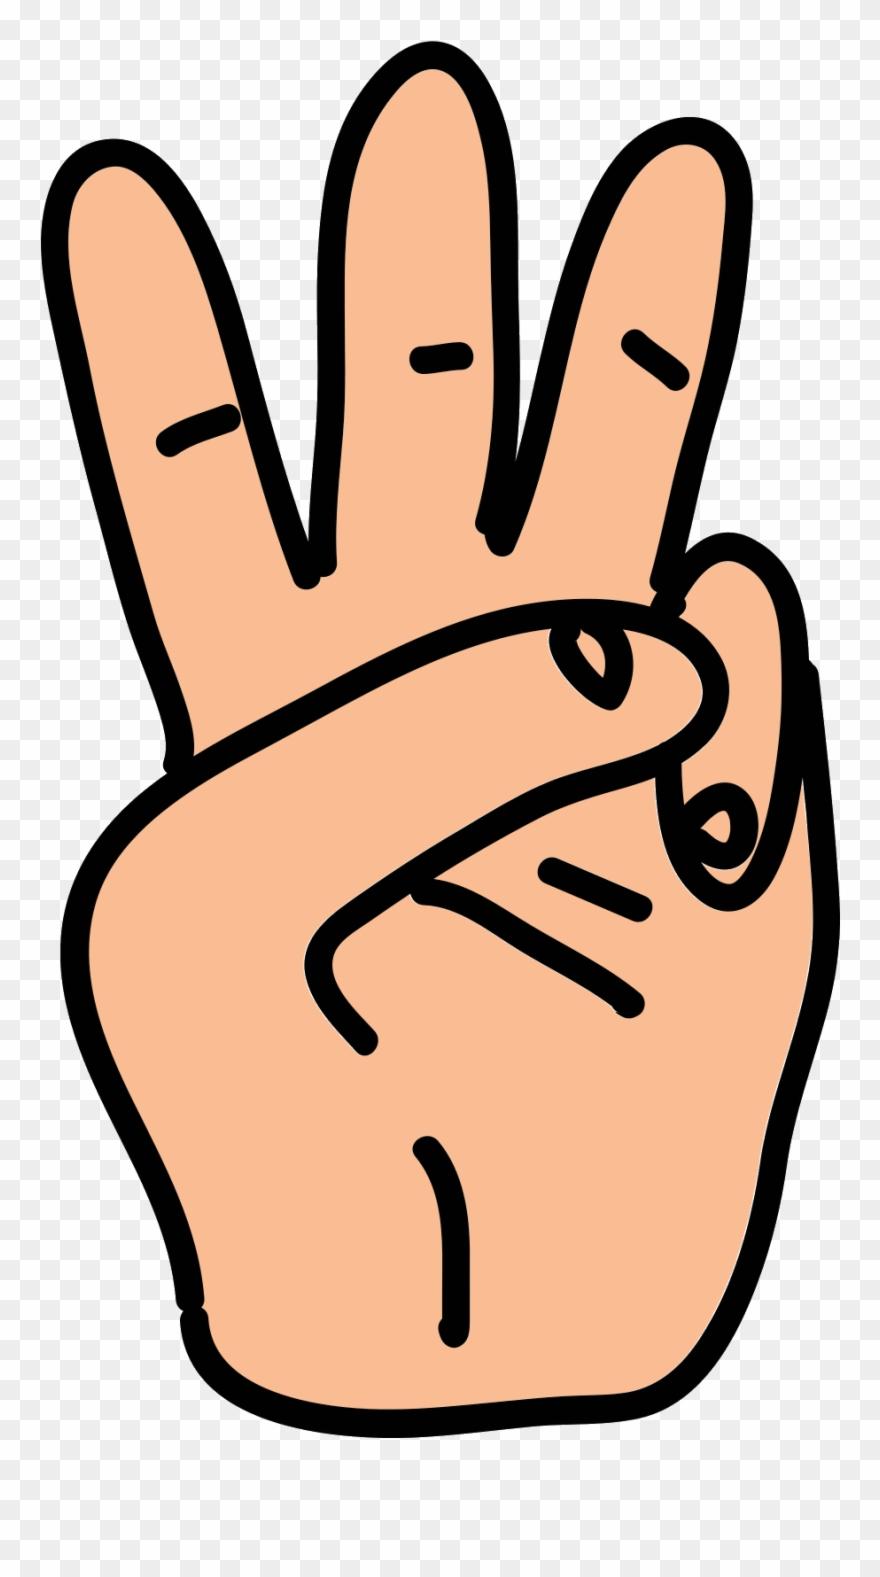 Finger clipart three finger. Snap fingers clip art